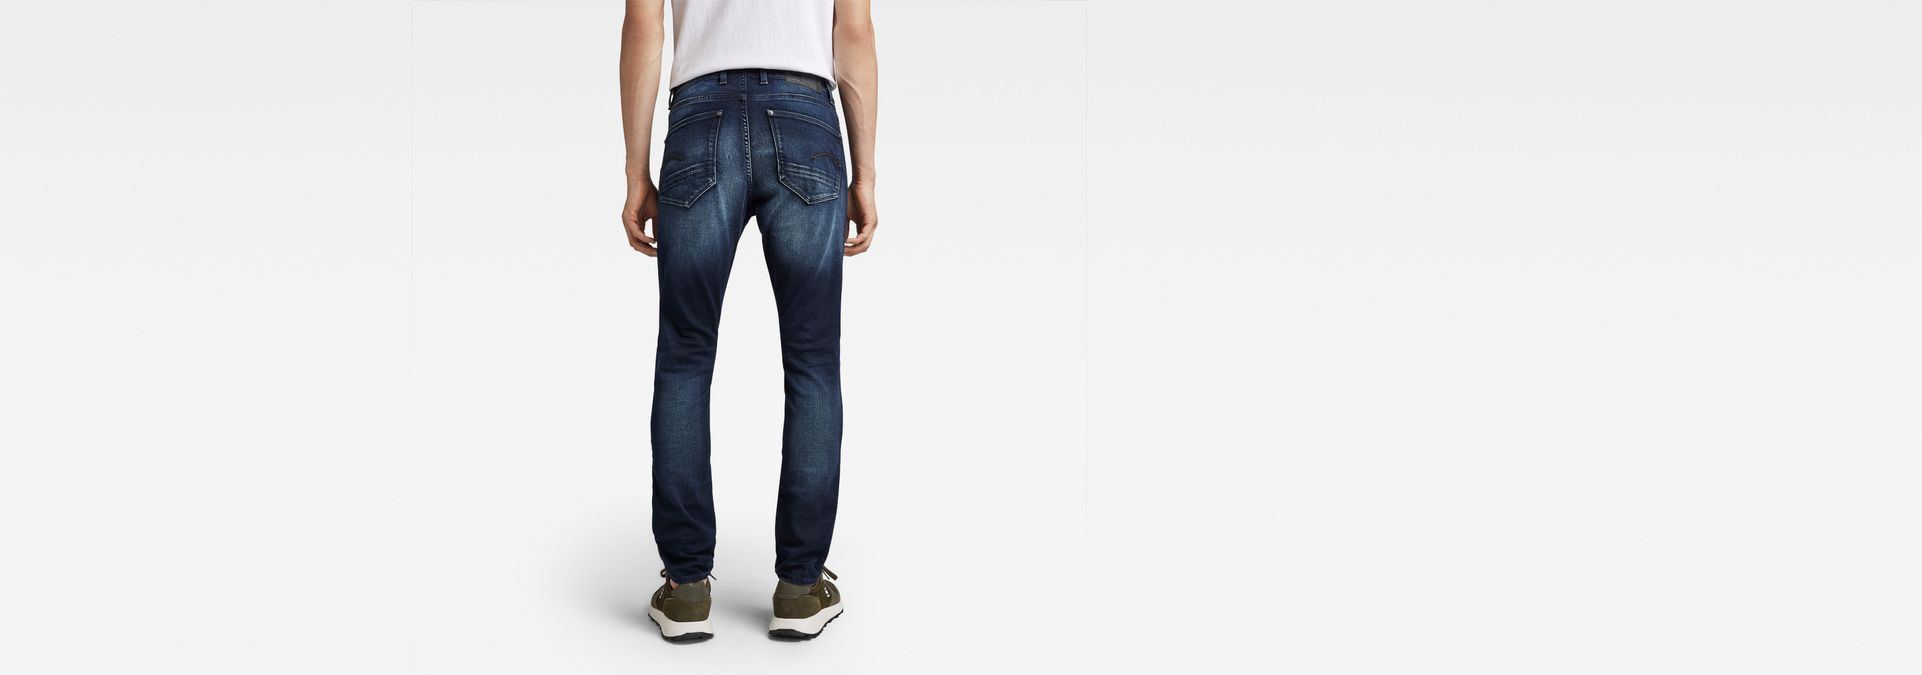 ... G-Star RAW® Revend Skinny Jeans Dark blue ...